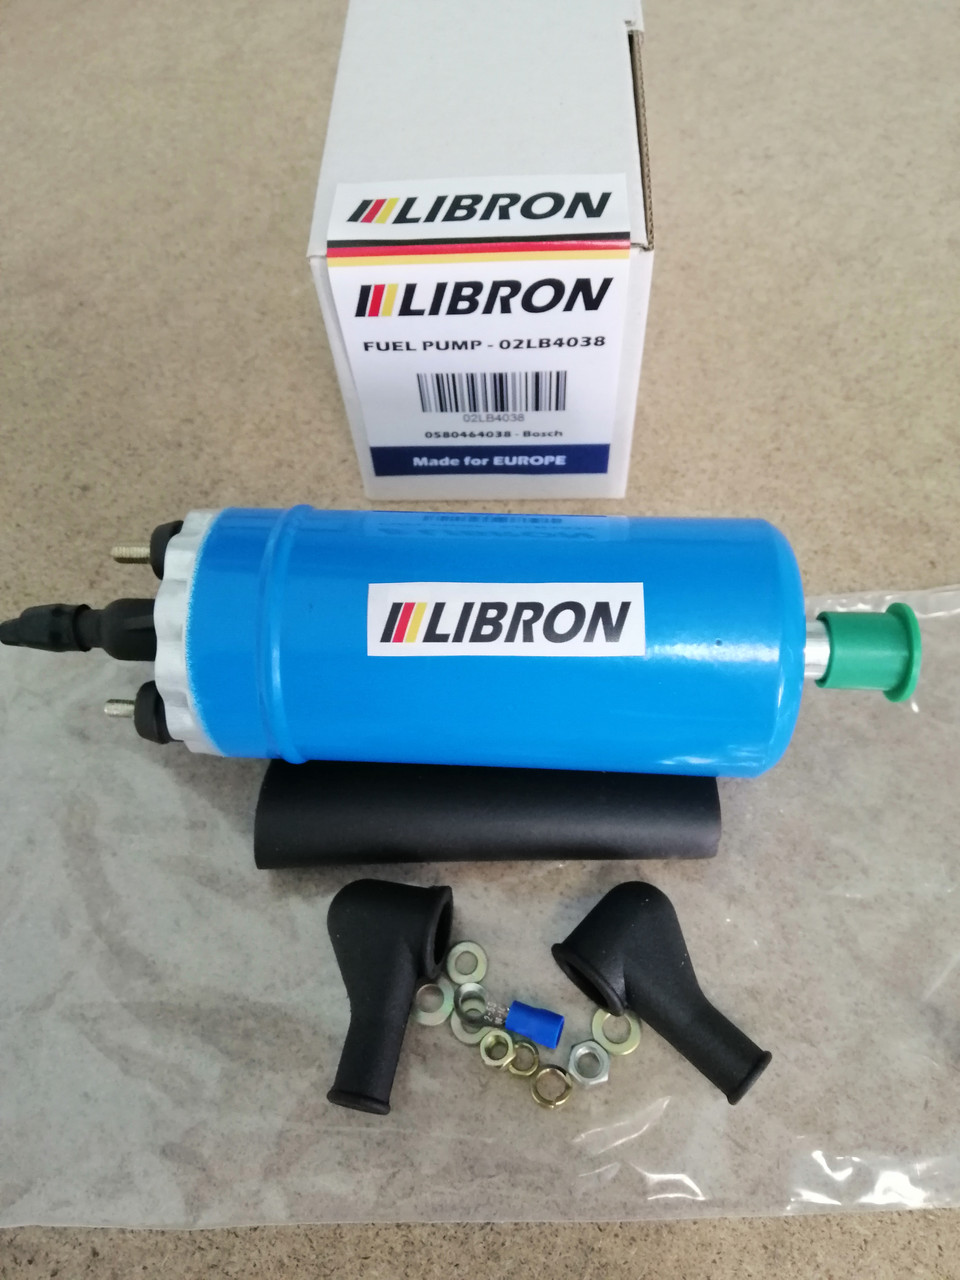 Бензонасос LIBRON 02LB4038 - OPEL KADETT E (39_, 49_) 2.0 i (1987-1991)